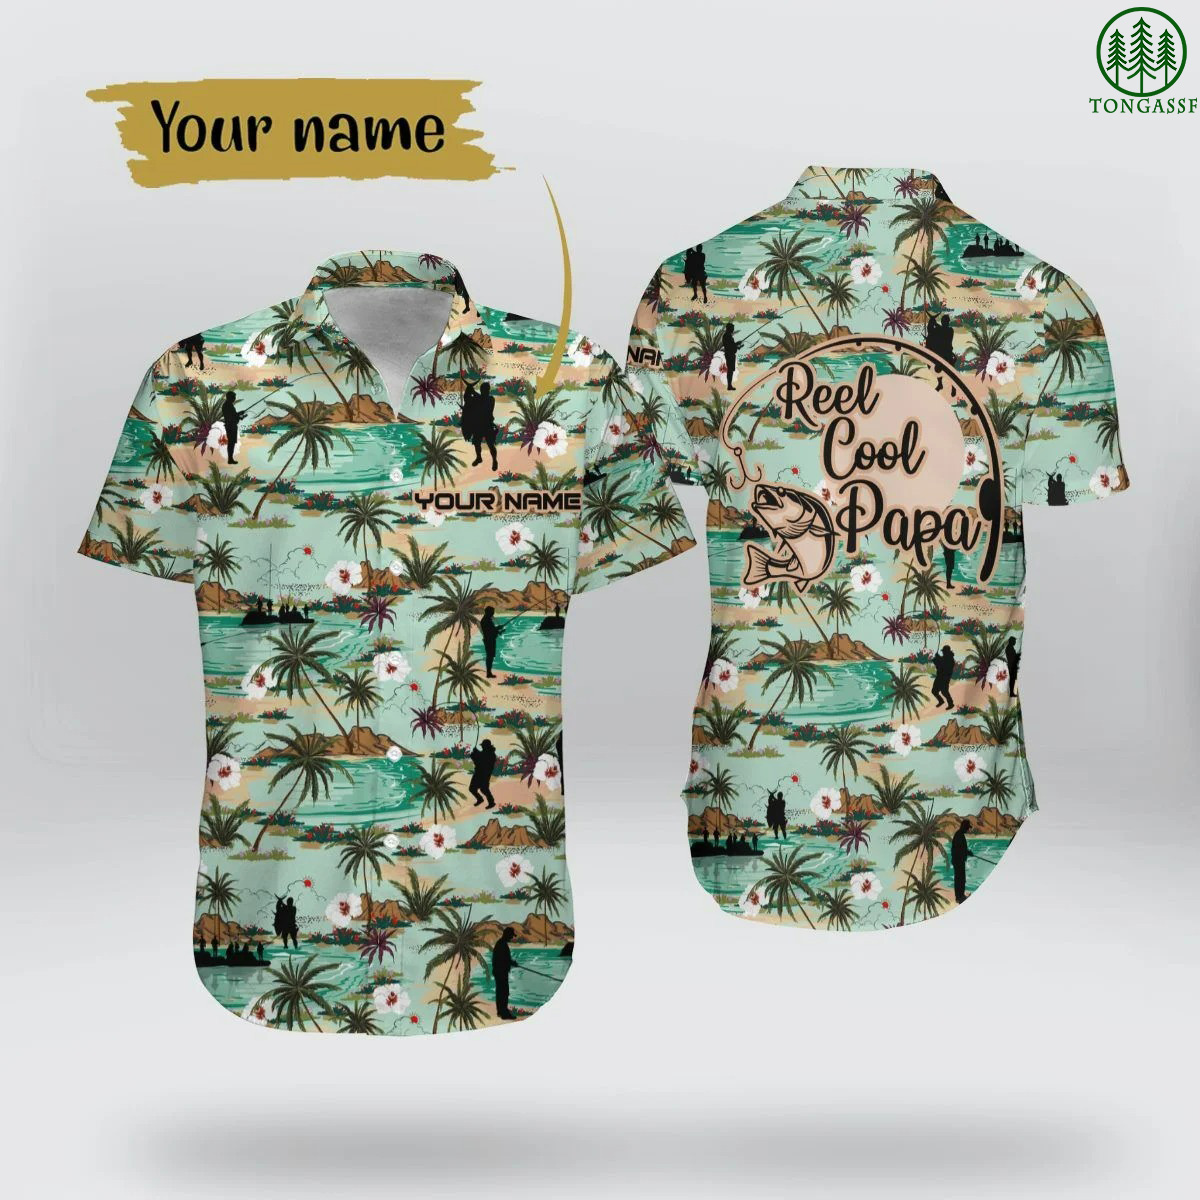 Custom Name Fishing Reel Cool Papa Hawaiian Shirt